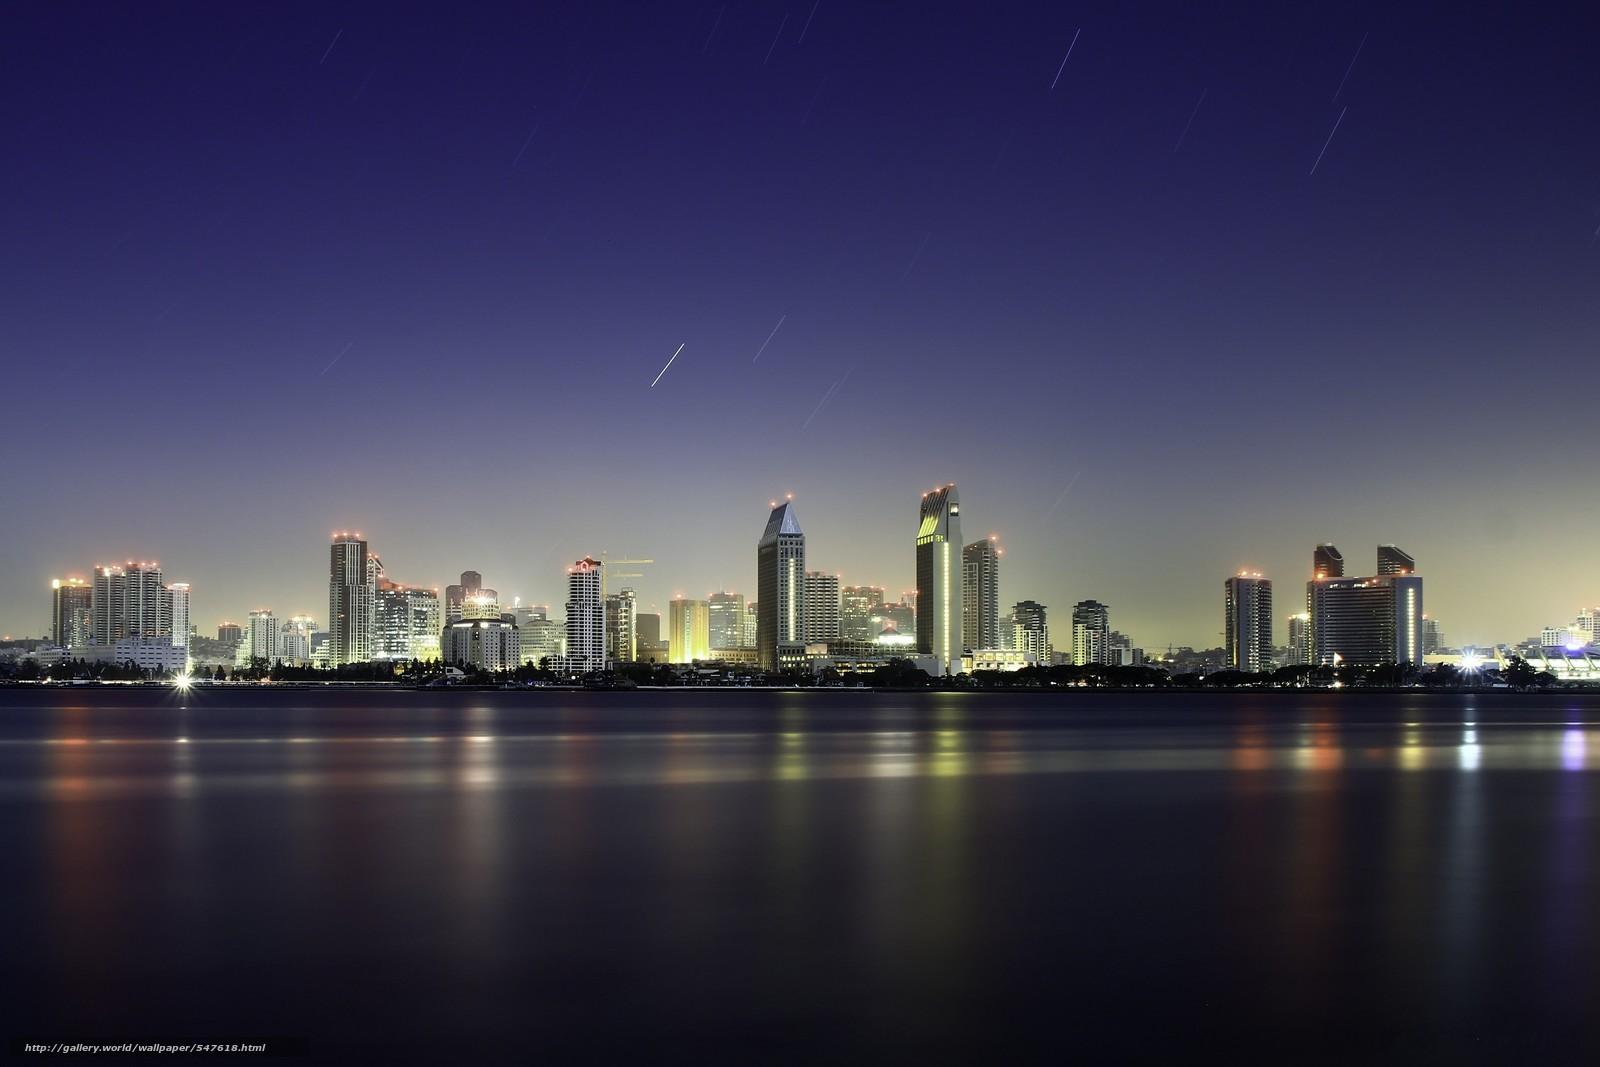 wallpaper San Diego State of California USA desktop wallpaper 1600x1067